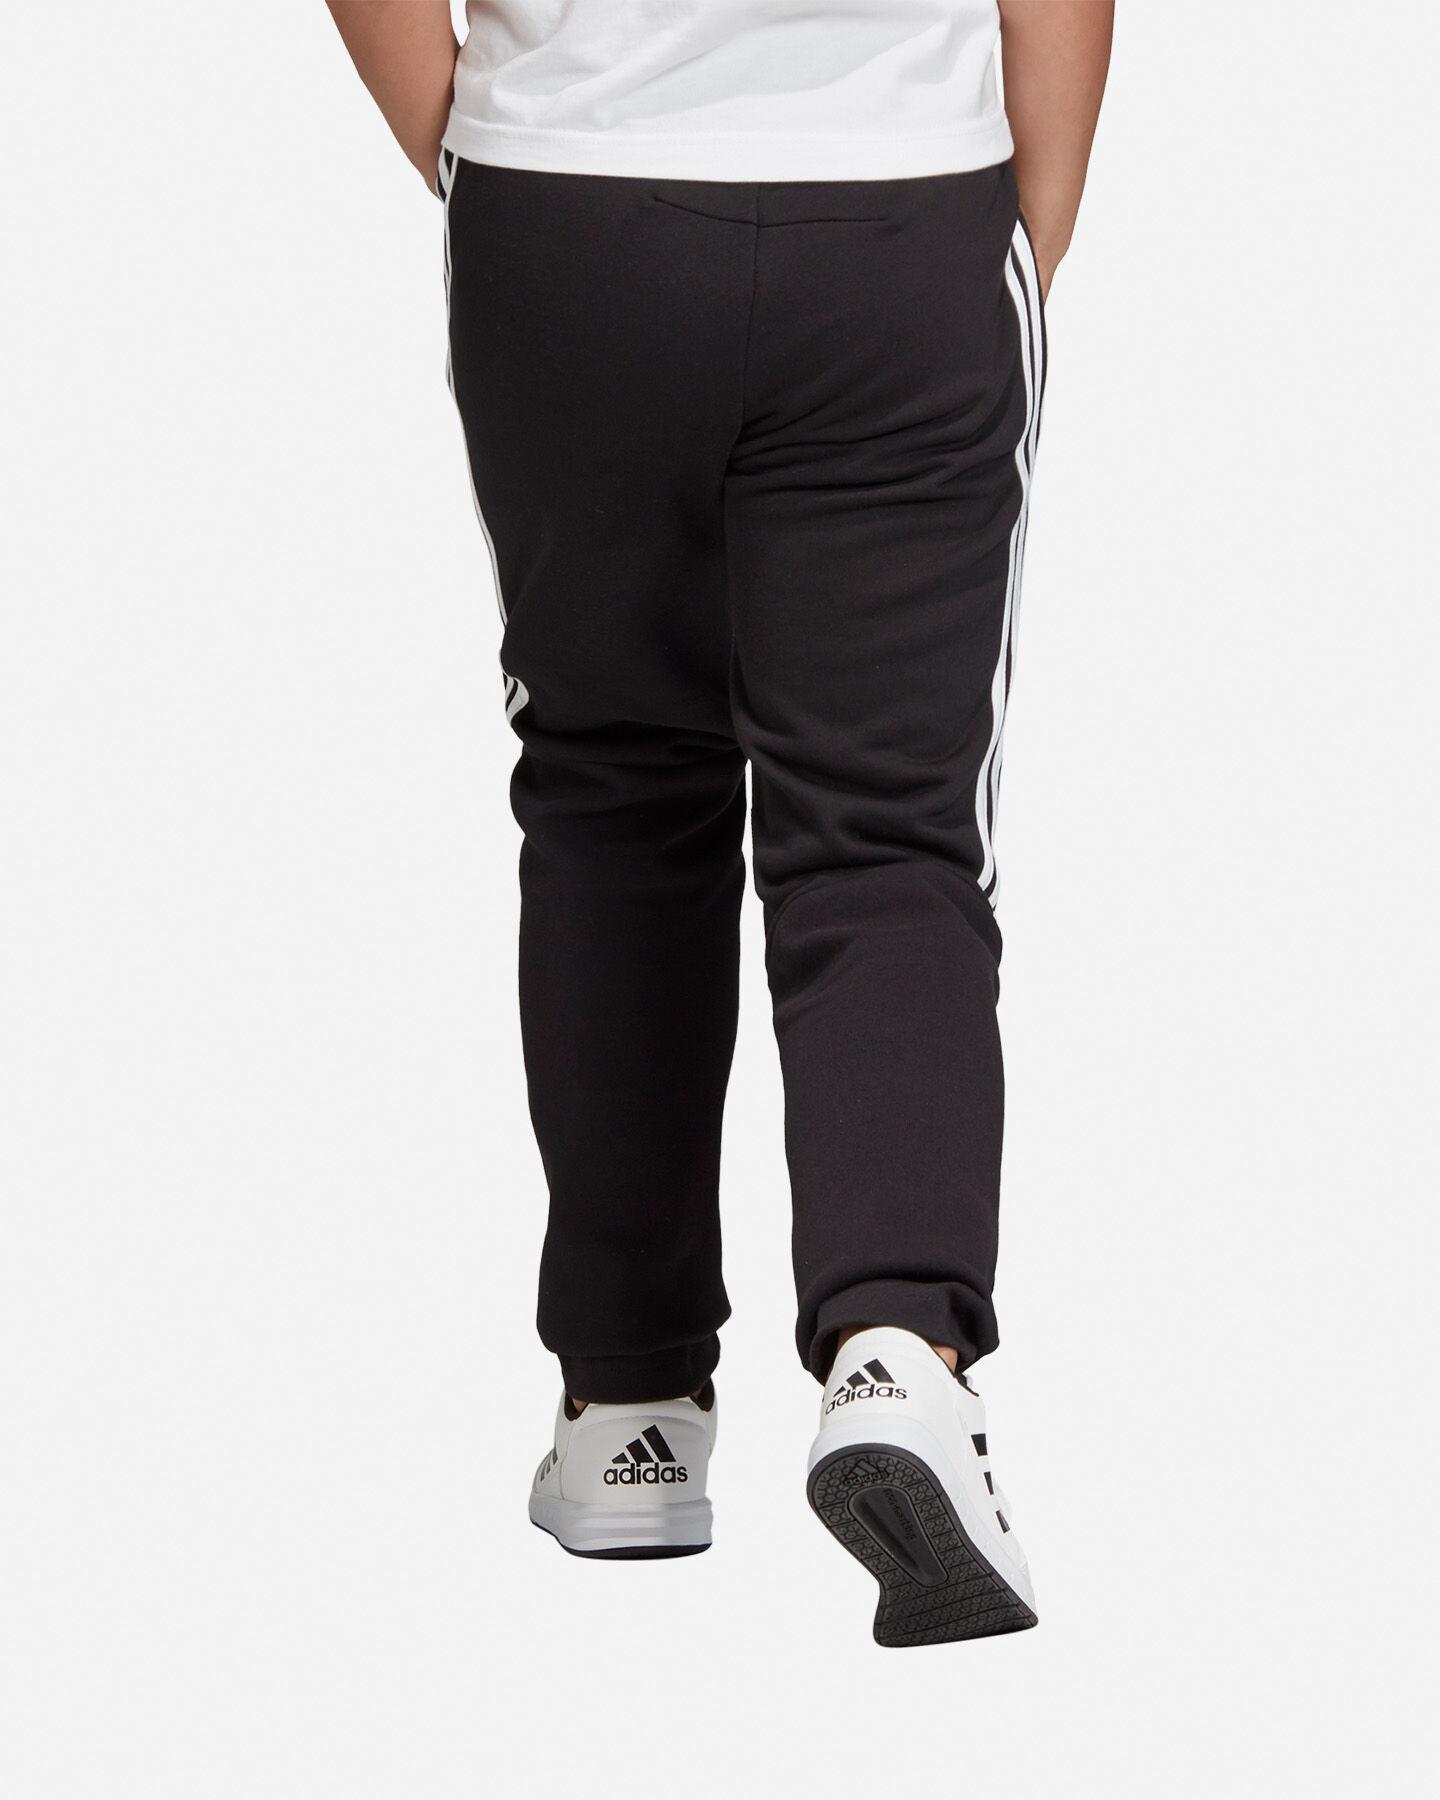 Pantalone ADIDAS MUST HAVES TIRO JR S2014747 scatto 4